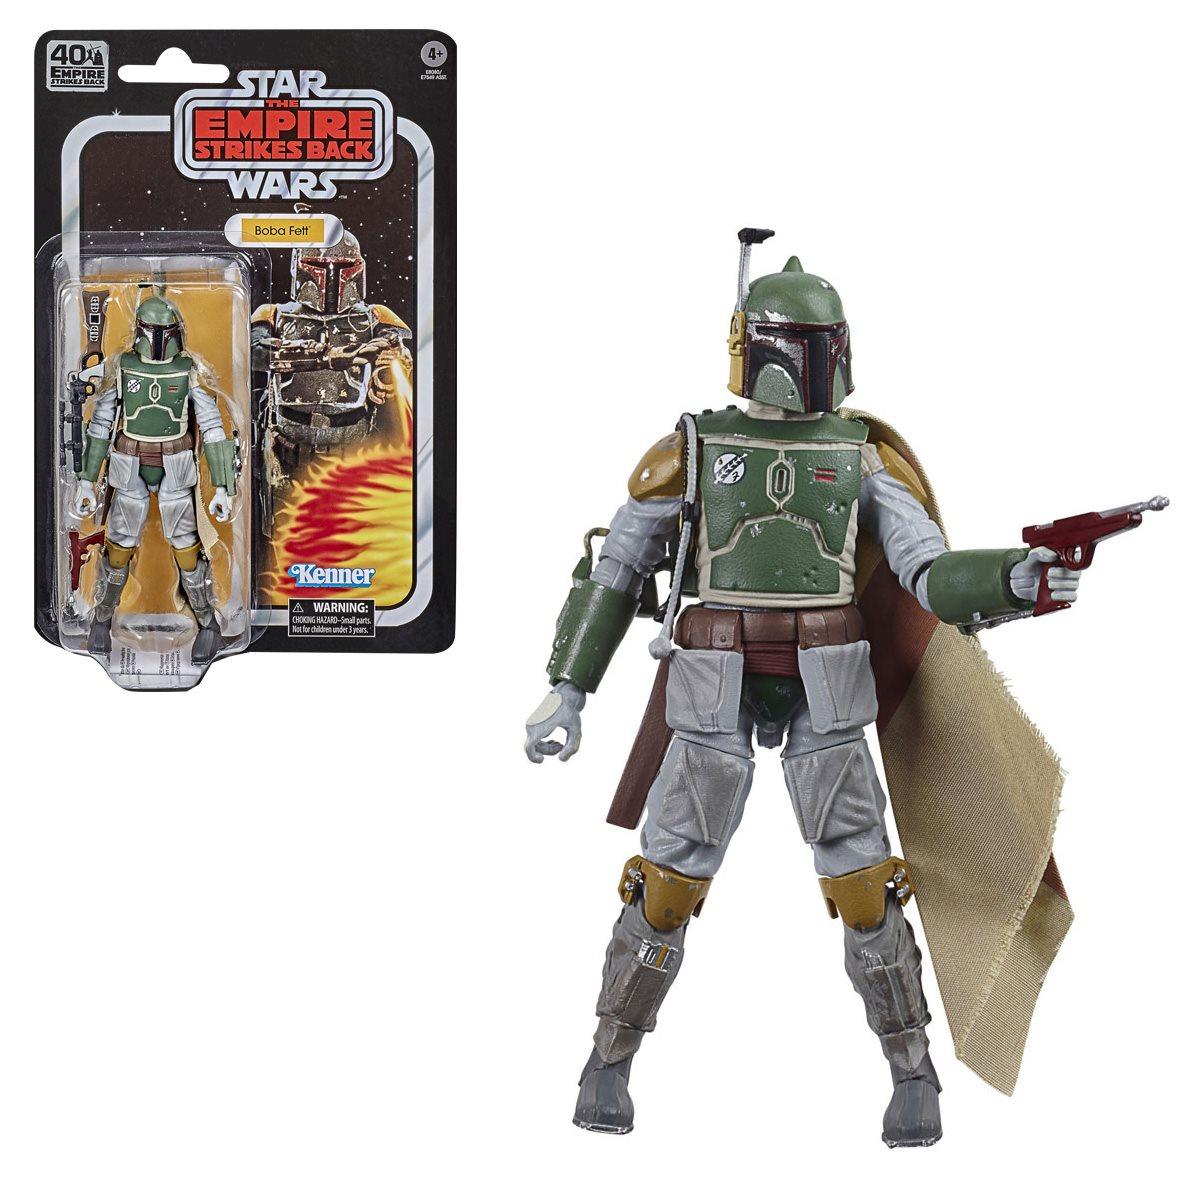 Star Wars The Black Series Empire Strikes Back 40th Anniversary 6 Inch Boba Fett Action Figure